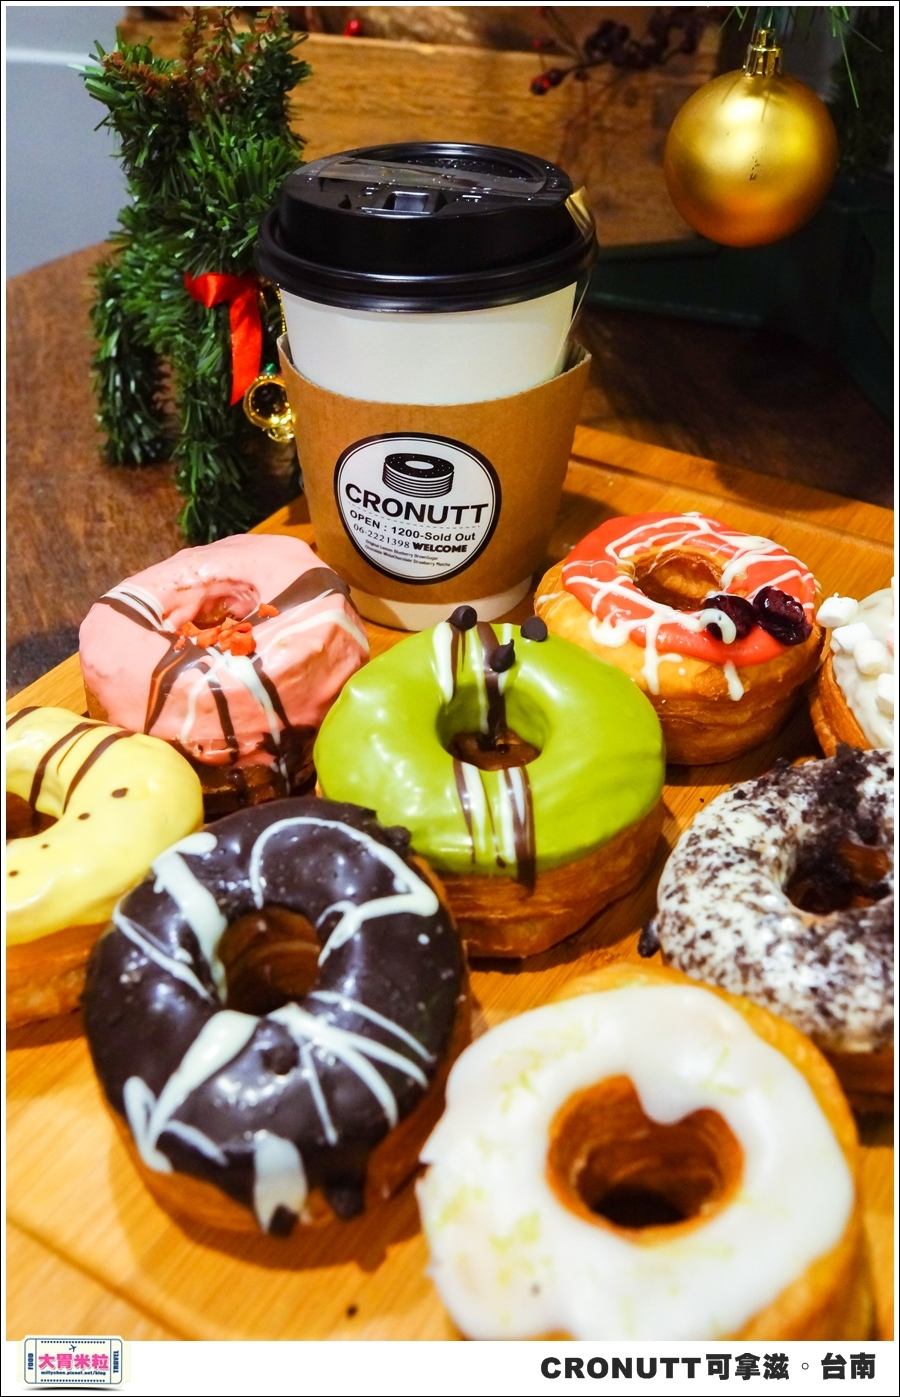 CRONUTT可拿滋台南店@紐約可頌甜甜圈@大胃米粒0043.jpg